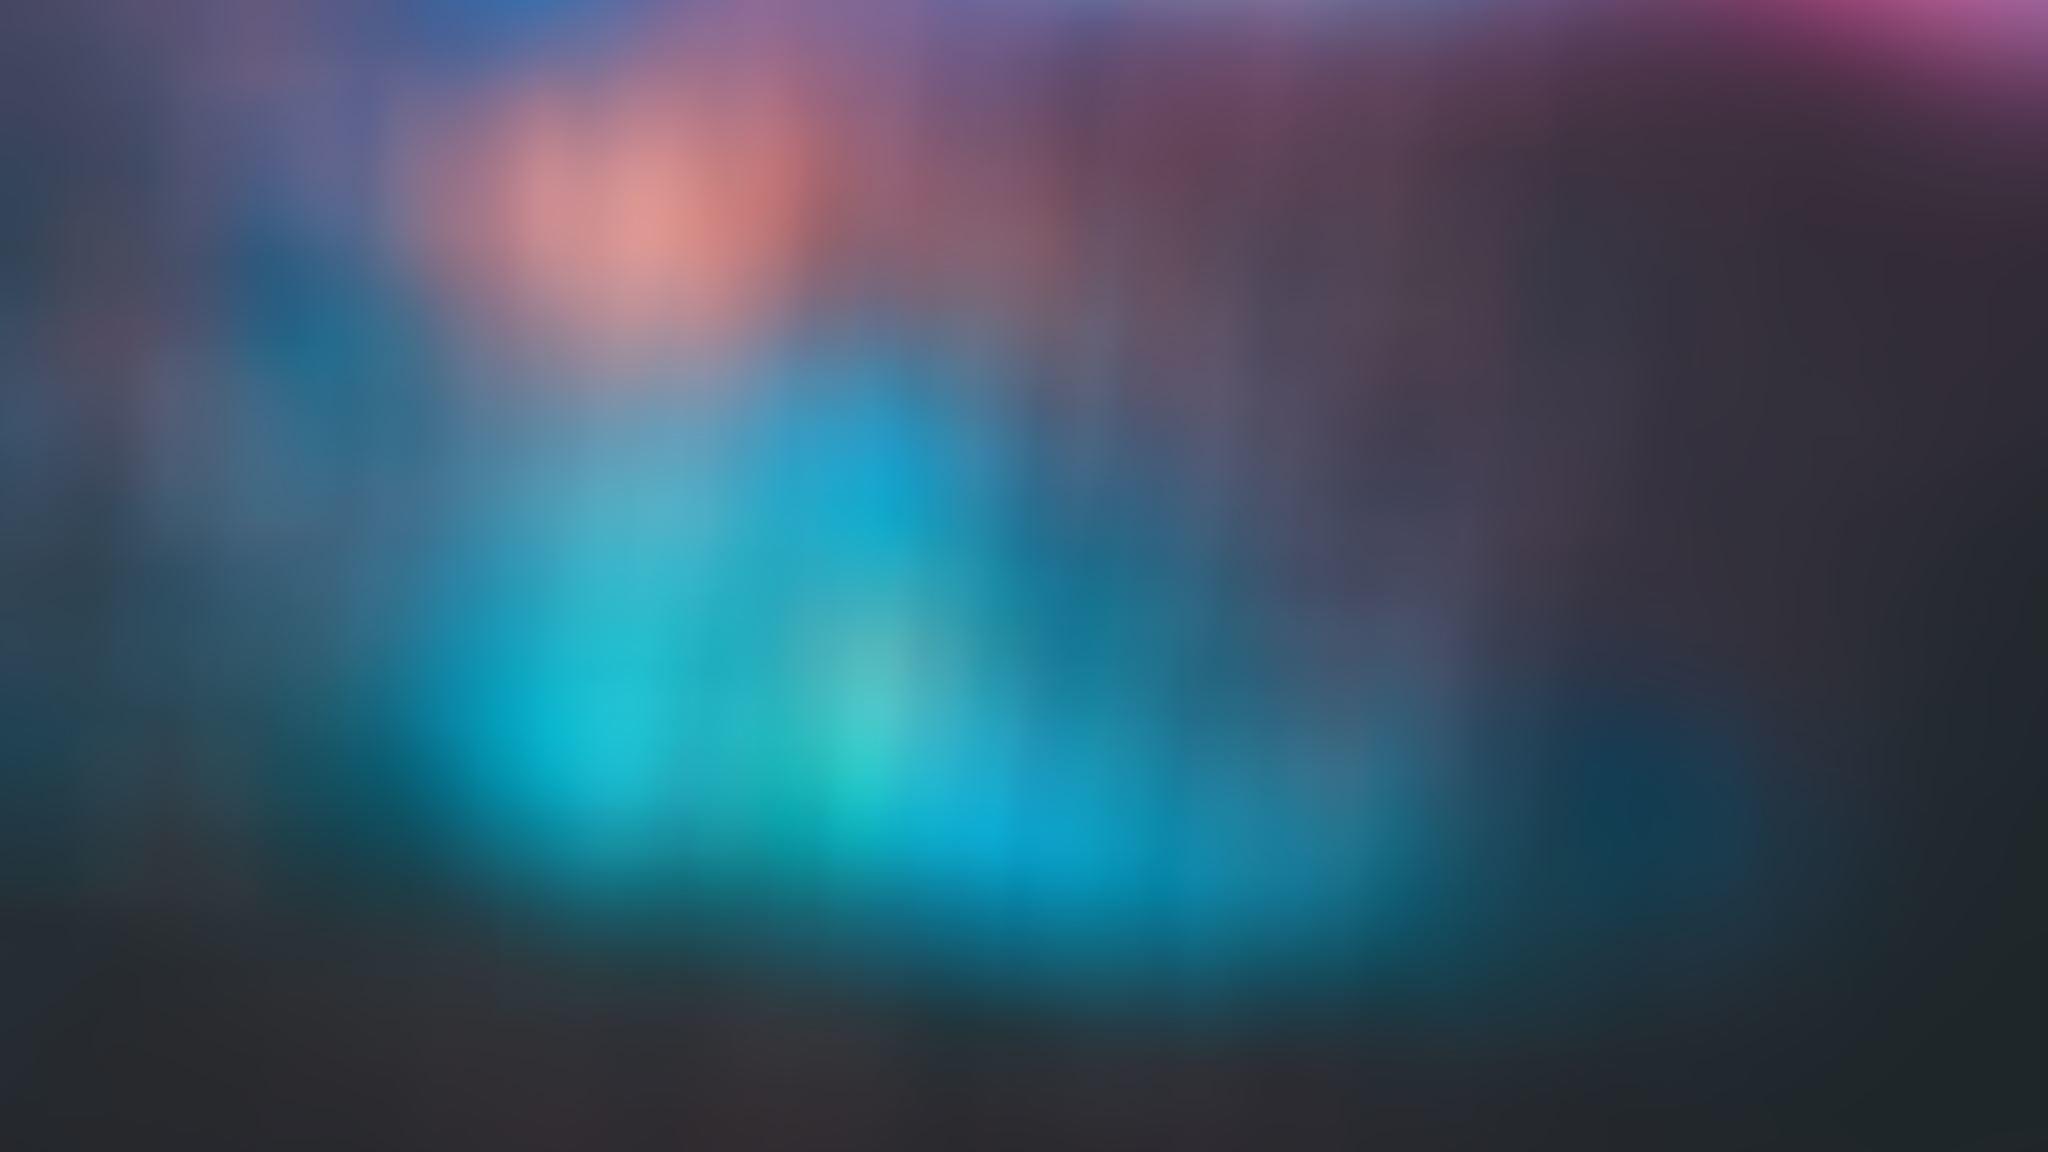 Res: 2048x1152, blur-blue-gradient-cool-background-sp.jpg